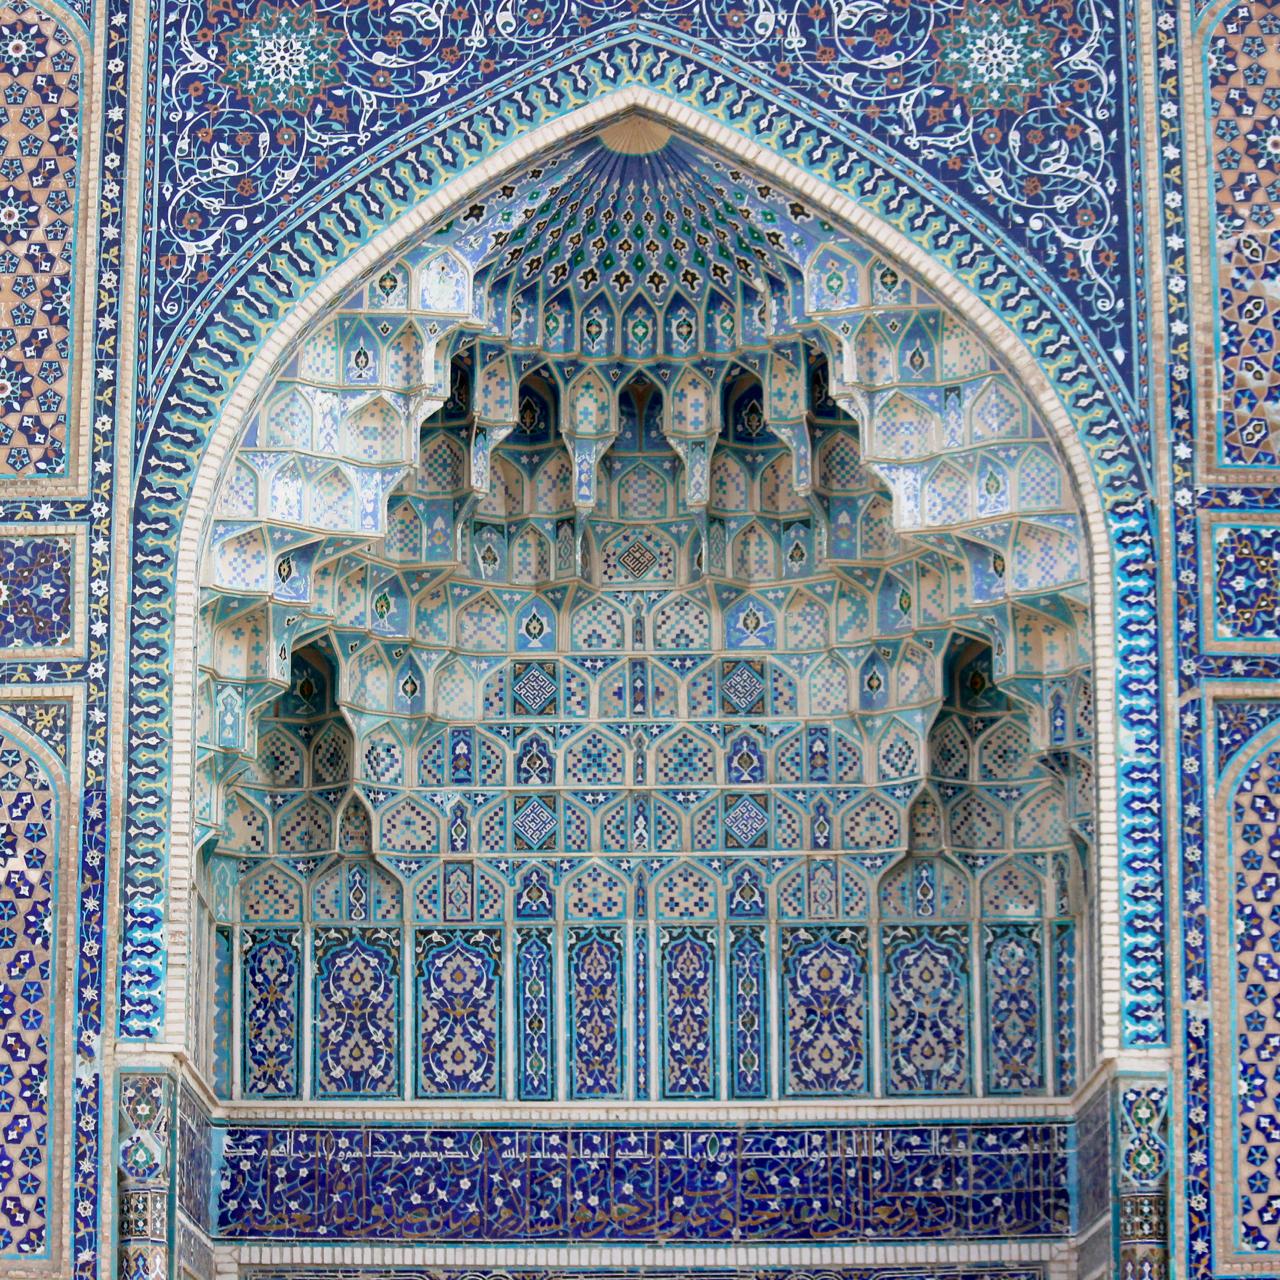 samarkand, uzbekistan - 14